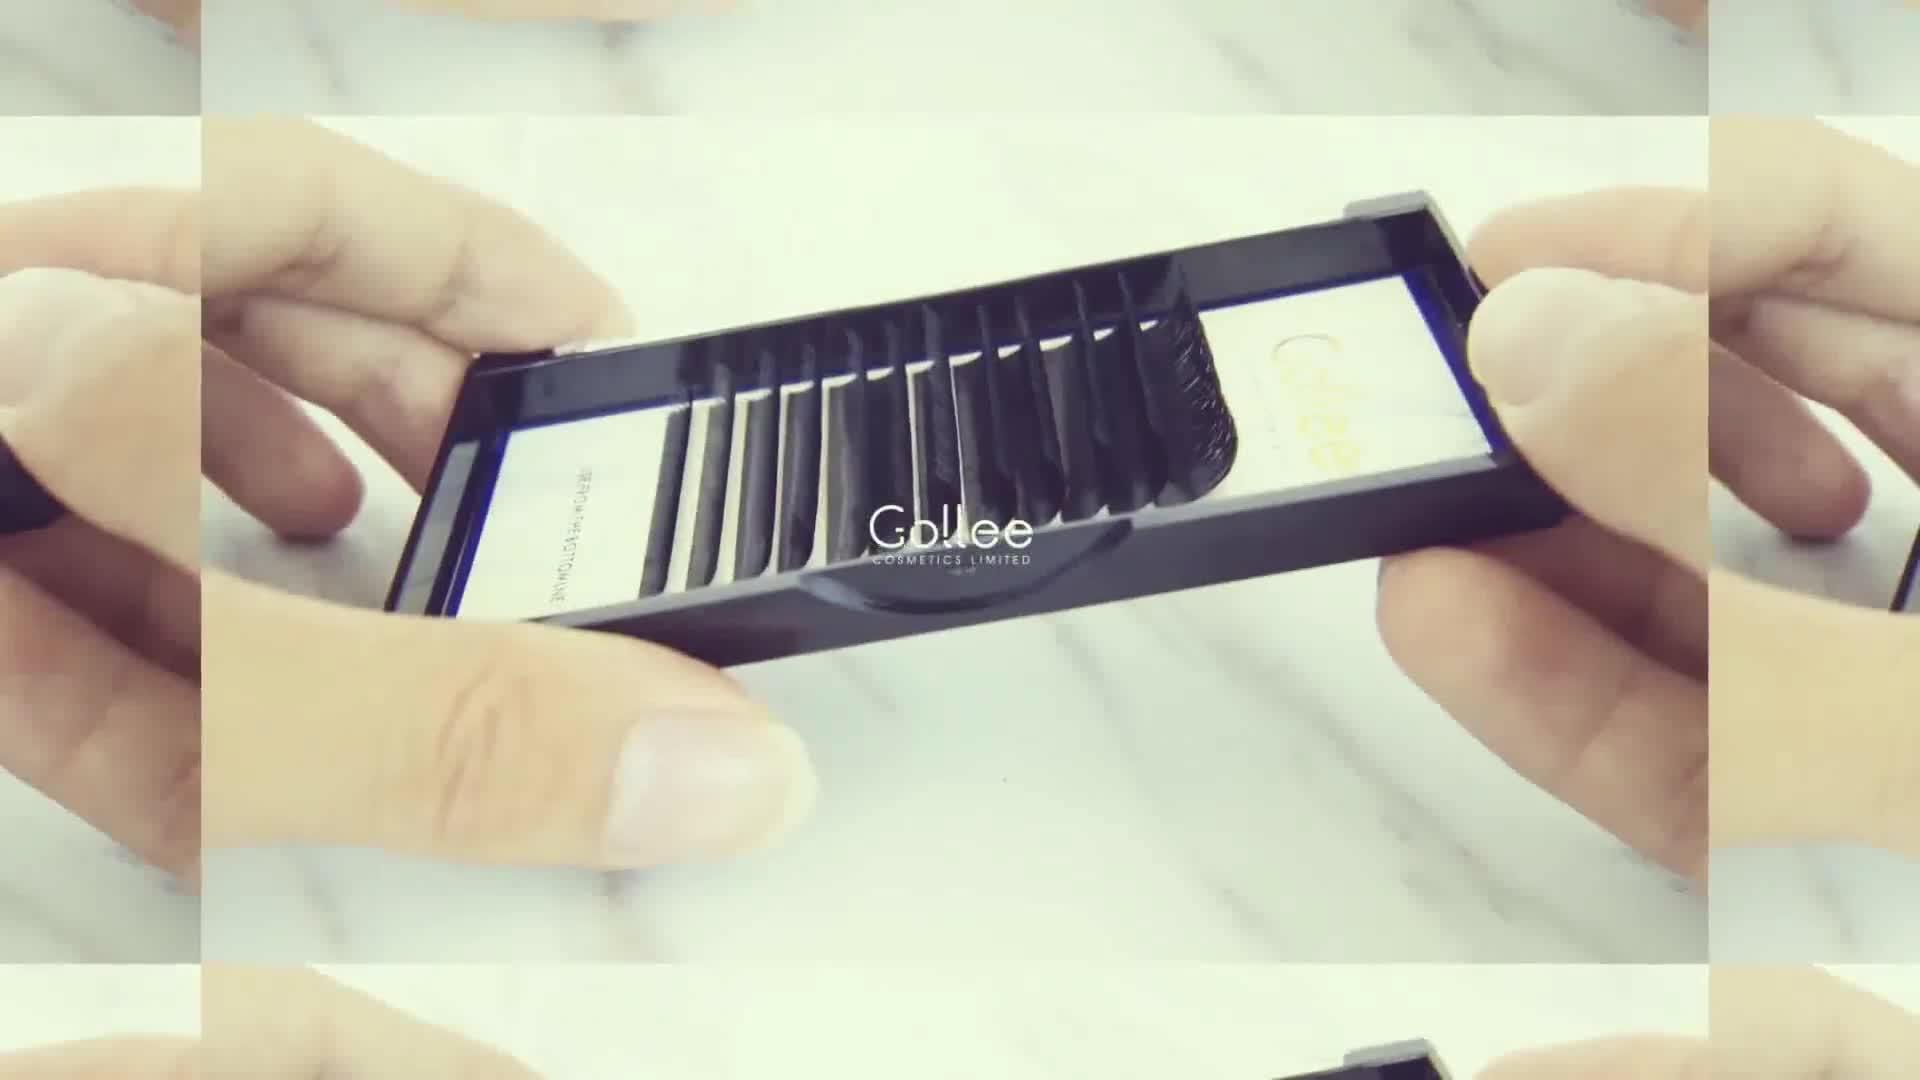 1s Fast Drying 8 Weeks Long Lasting Eyelash Extension Glue Strong Eyelash Glue Private Label